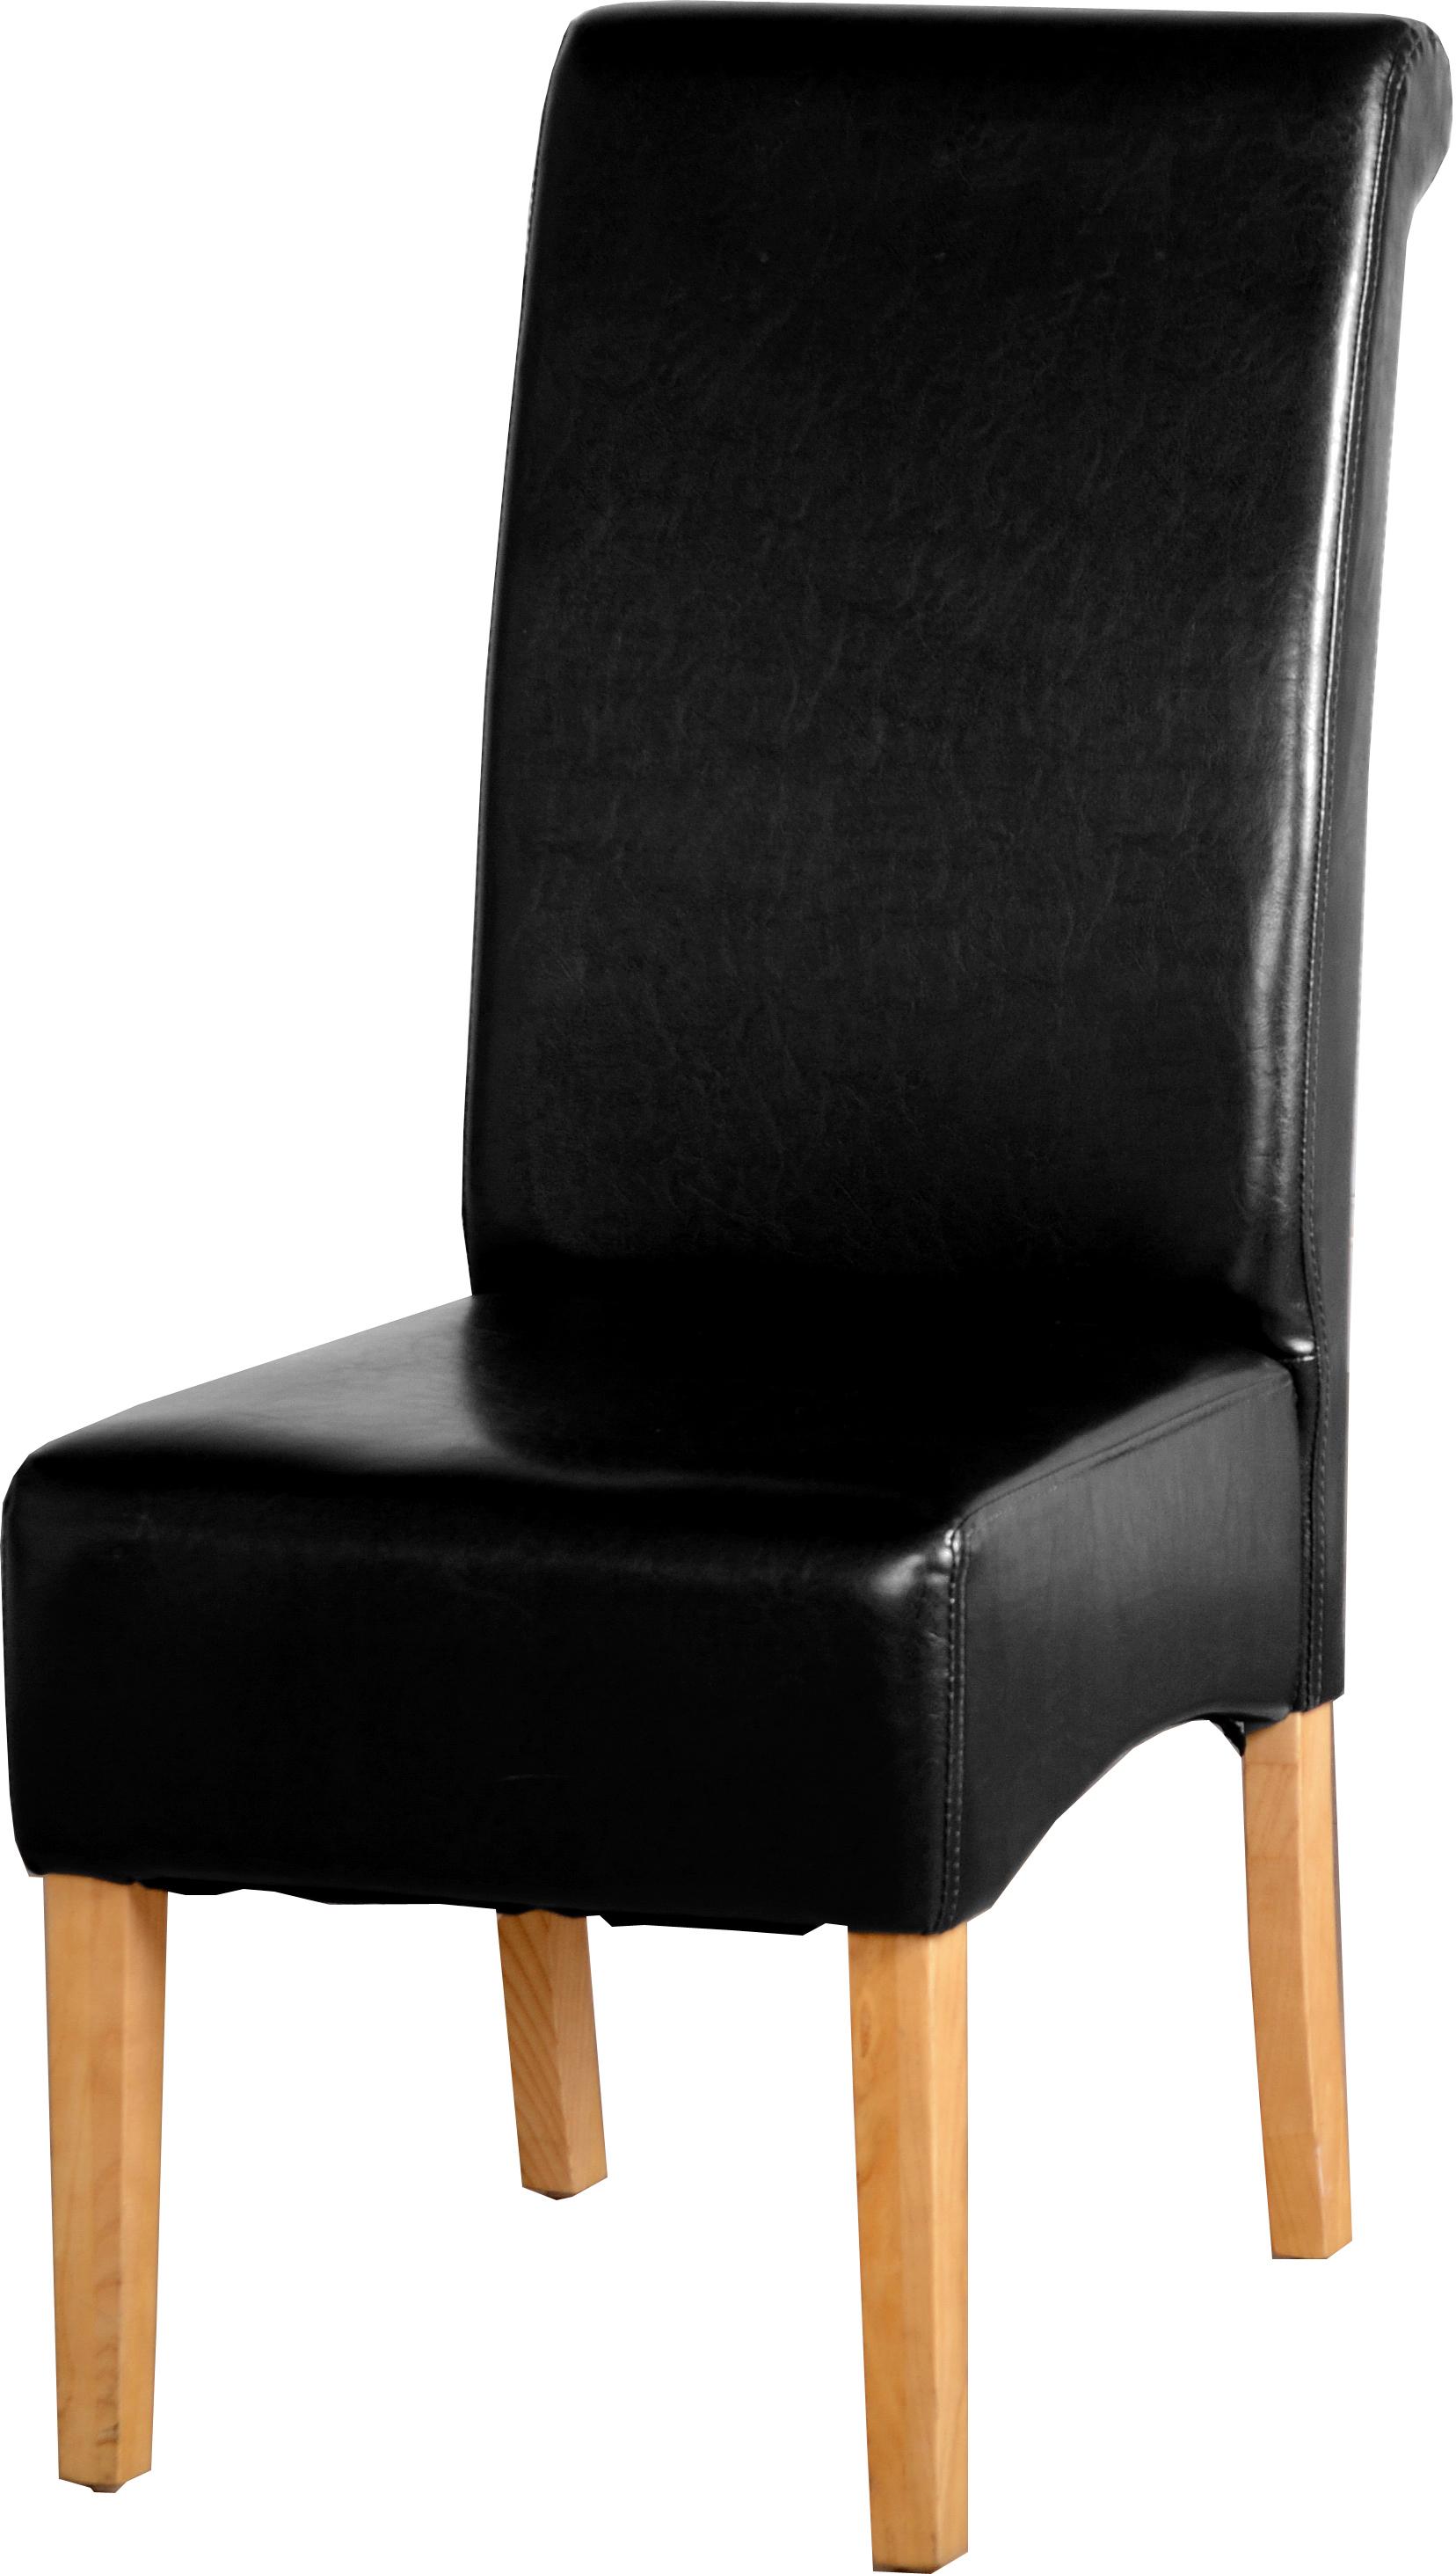 G10 Chair Black Pu